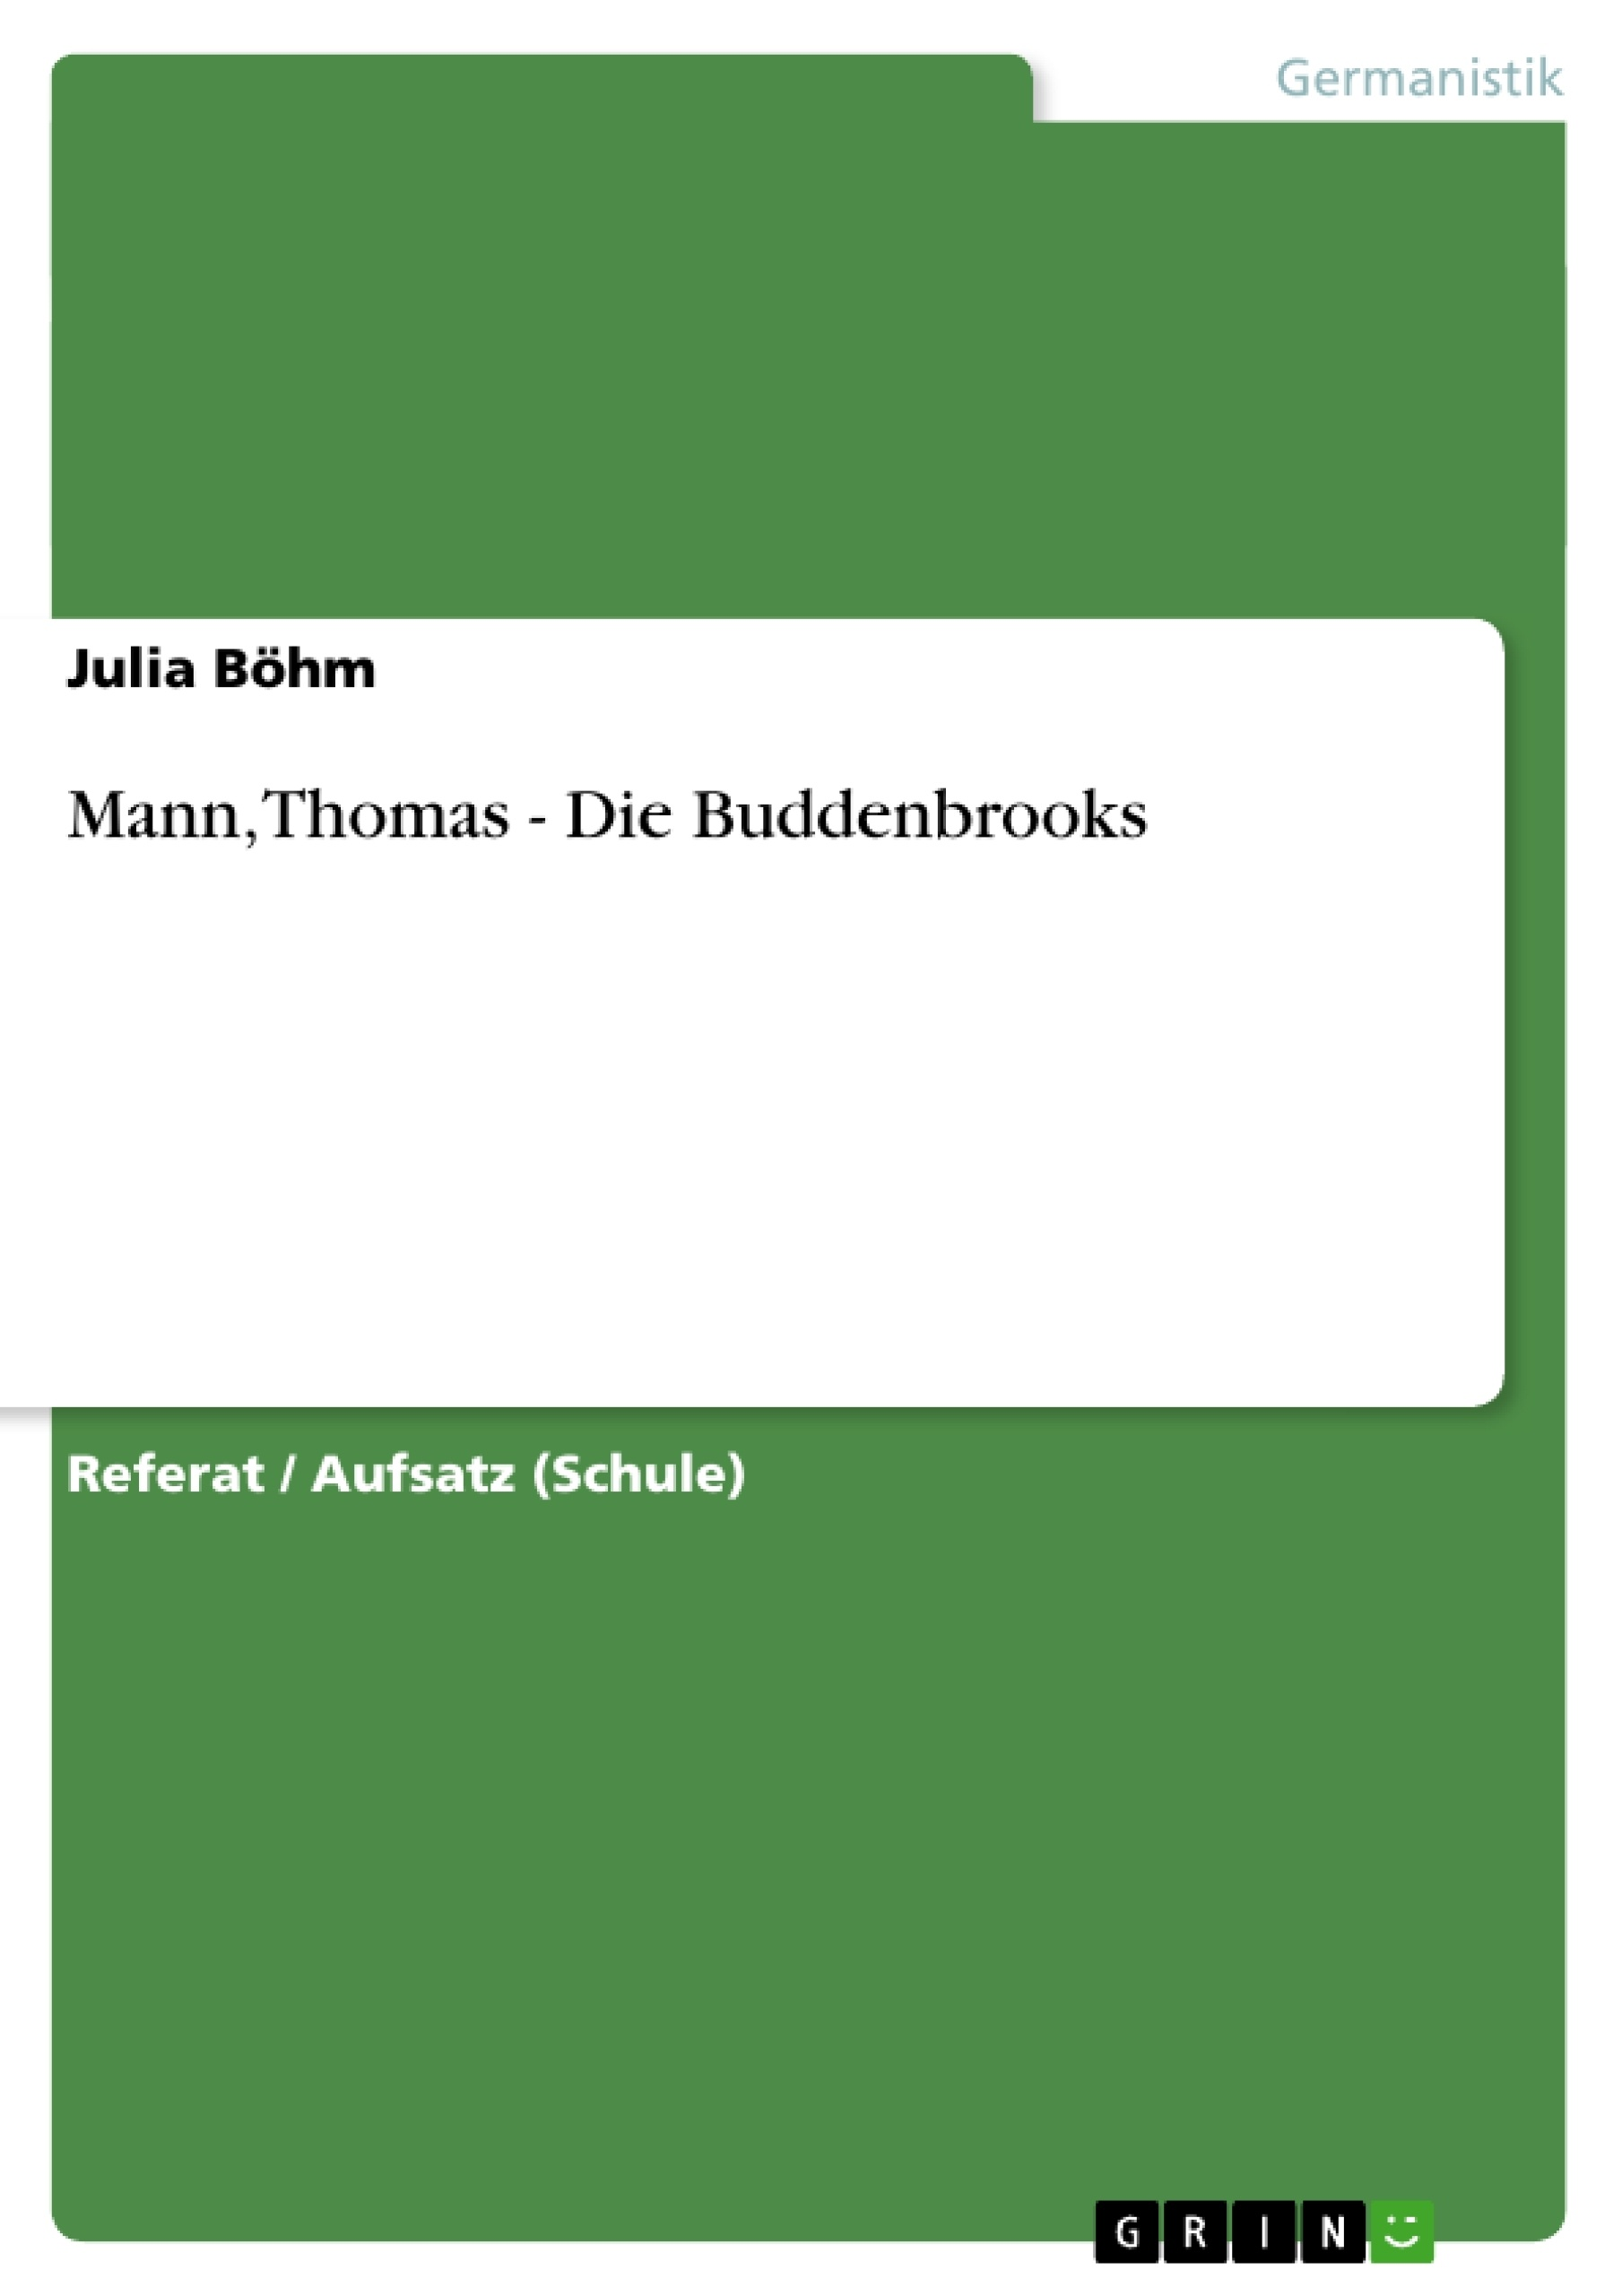 Titel: Mann, Thomas - Die Buddenbrooks